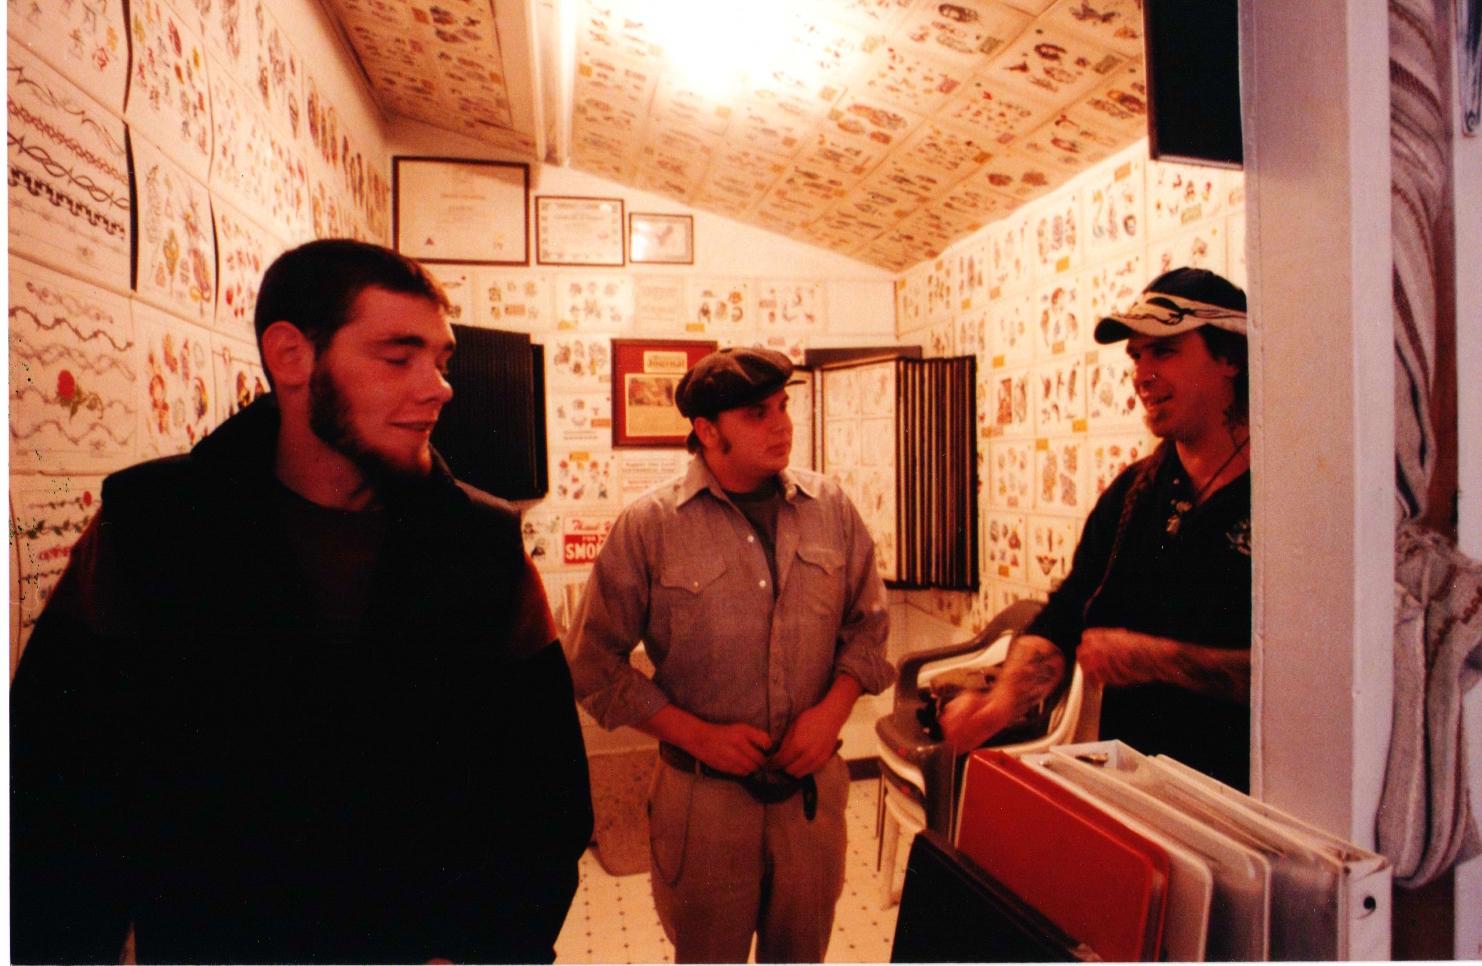 Inside Bozeman's Tattoos in the Alley, RJ Rosini's original MT shop. Old friends: Adam, Lunchbox, and Joker.